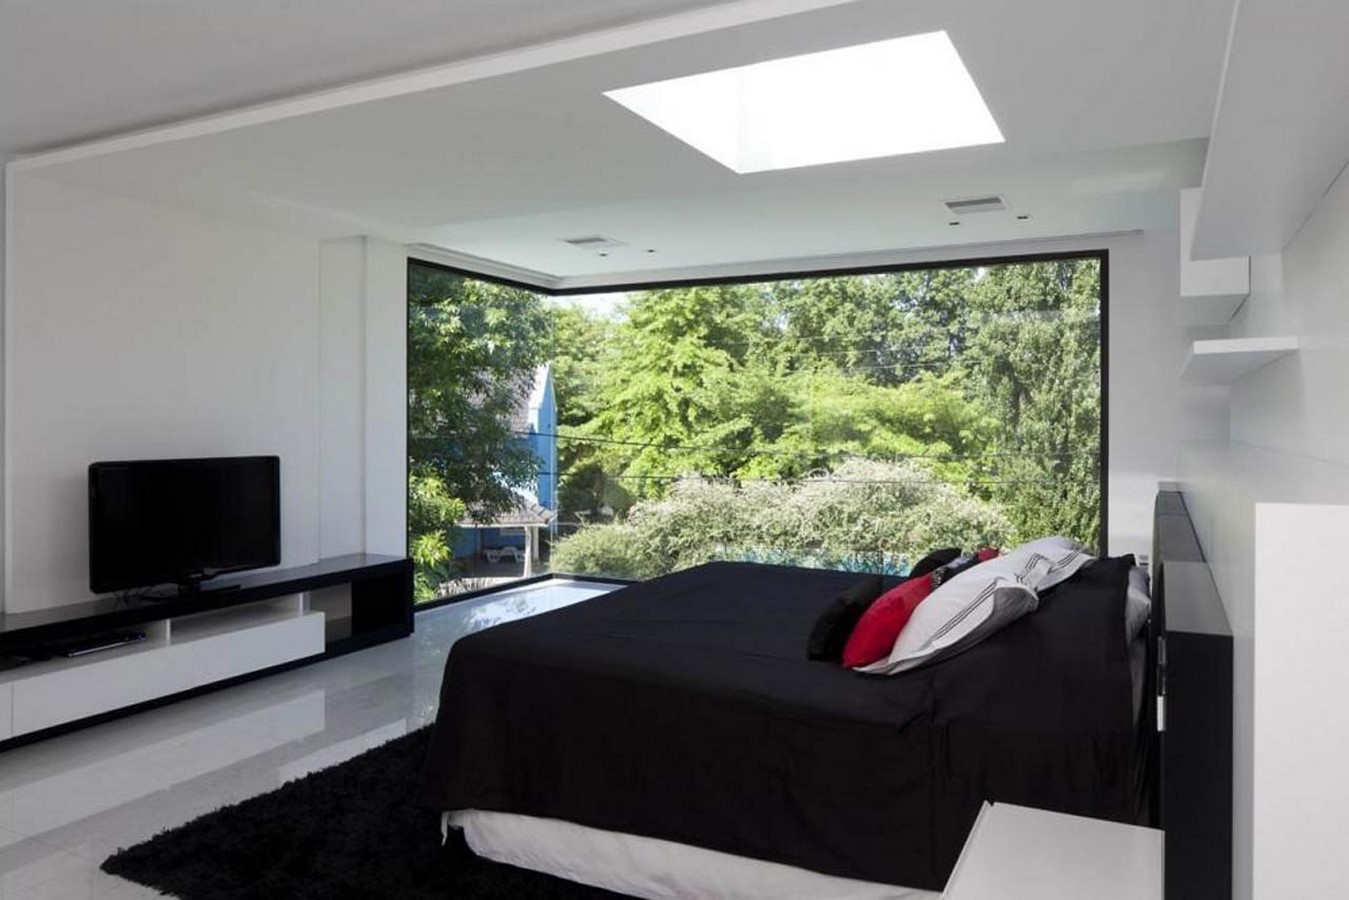 20 Futuristic bedroom interior ideas - Sheet8